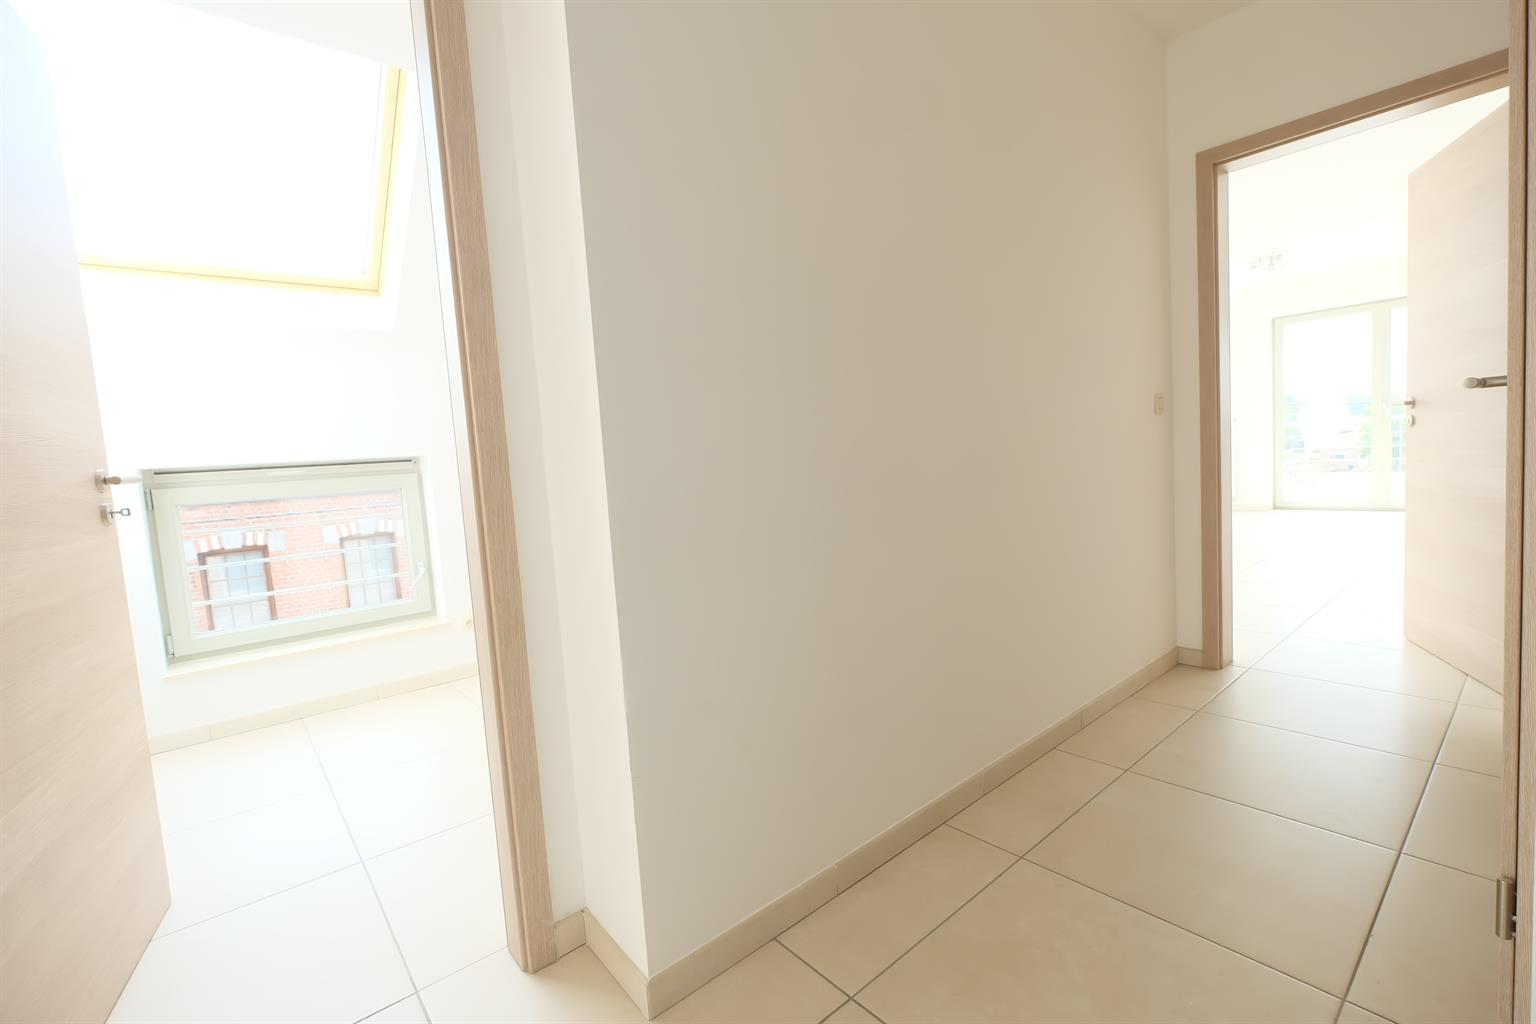 Appartement - Soignies - #4223150-9